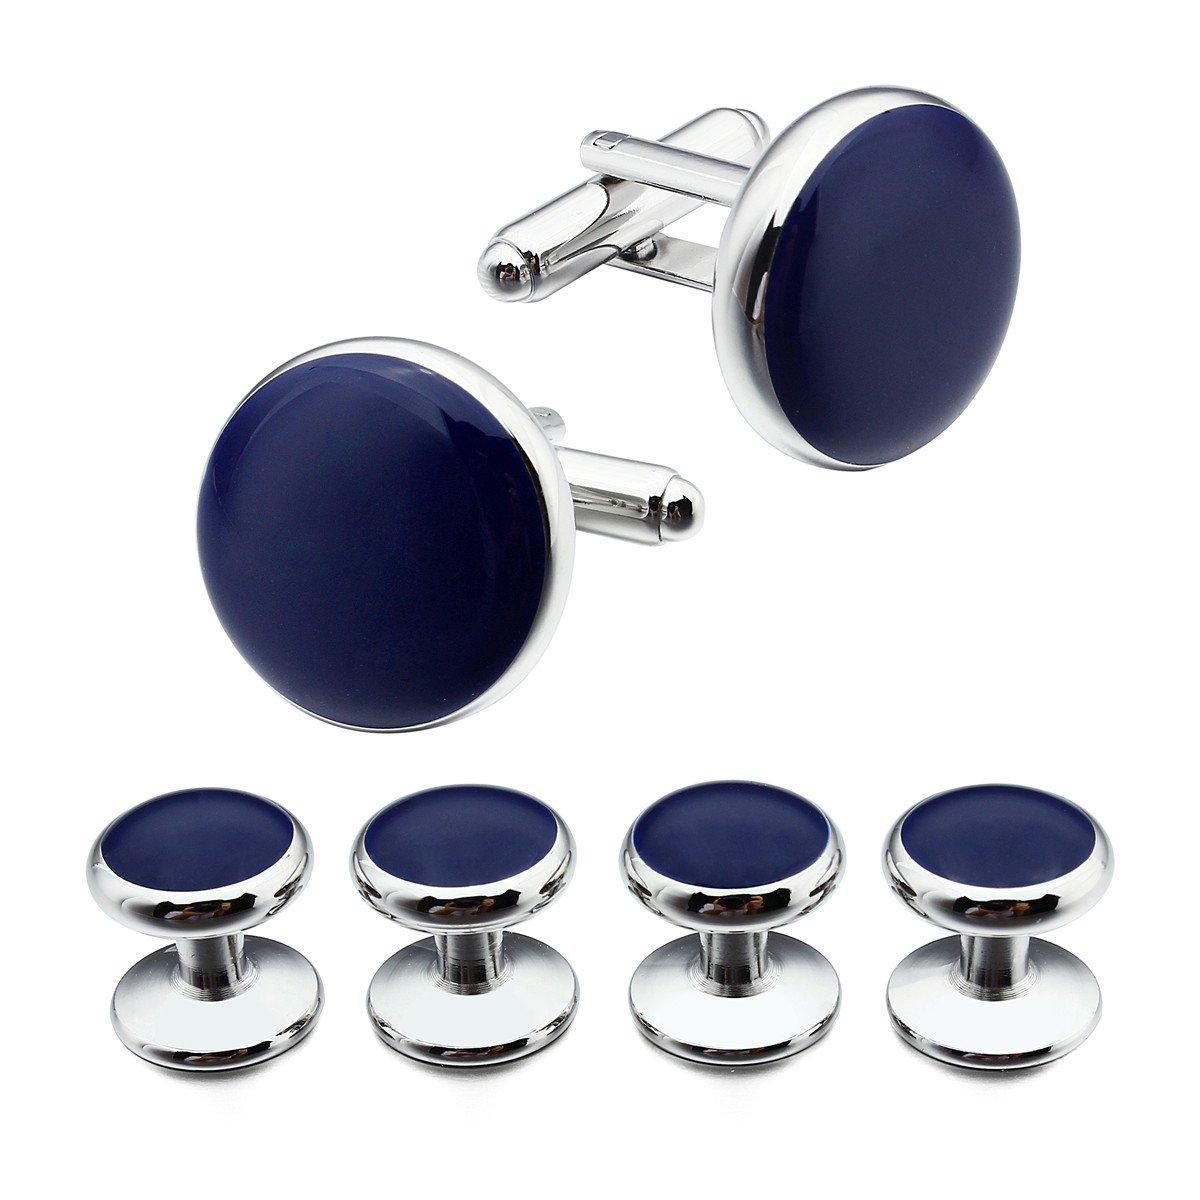 HAWSON Silver Blue Cufflinks and Tuxedo Studs Set for Mens Dress Shirt Business Wedding Accessories